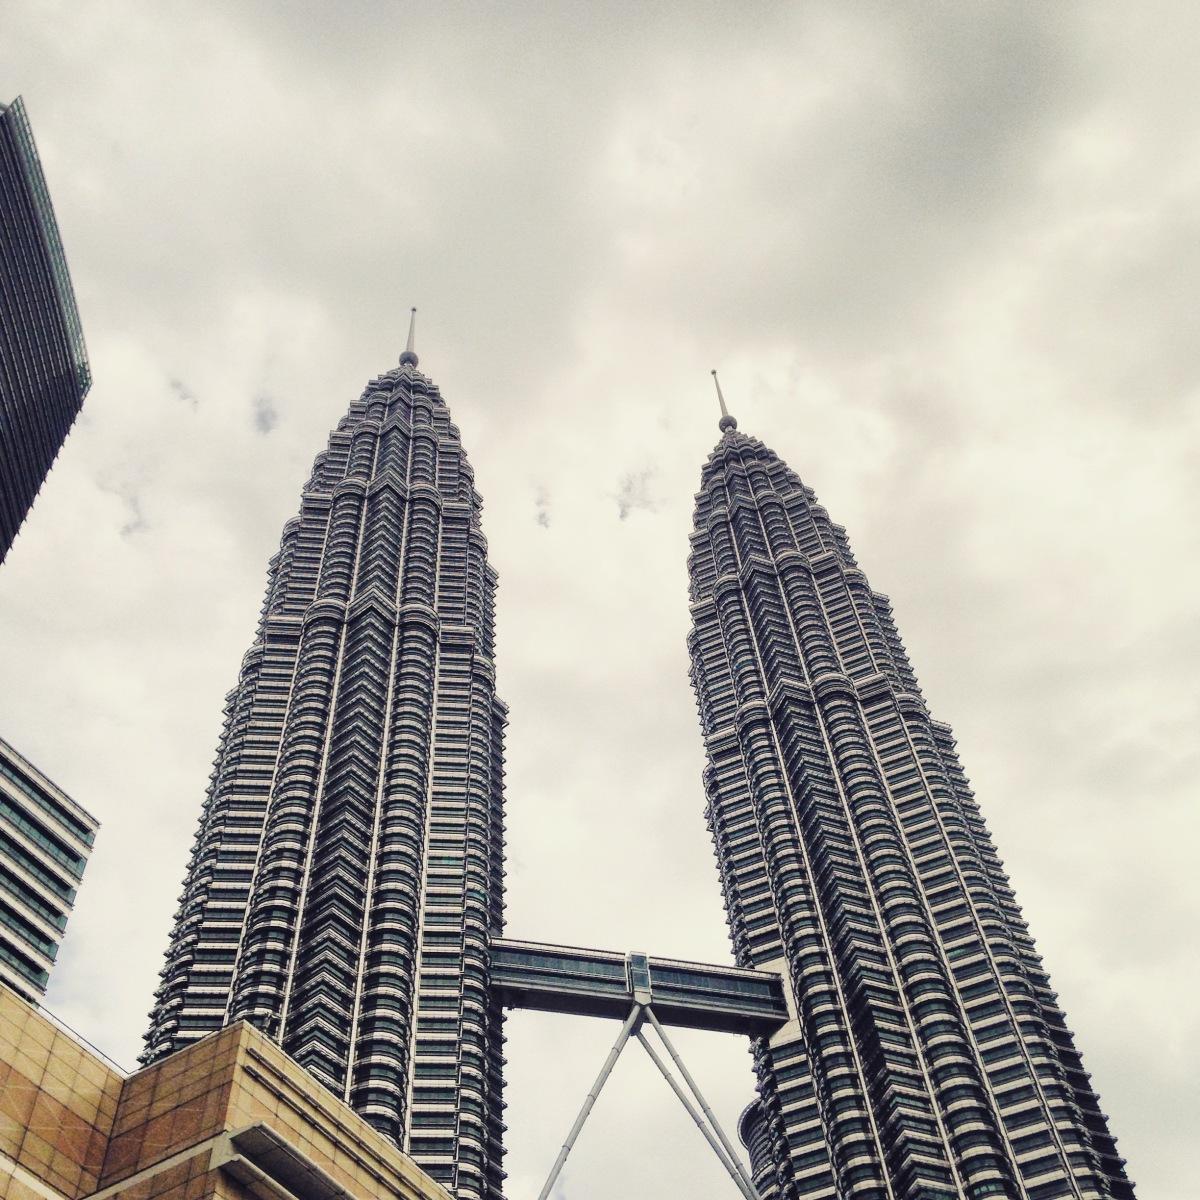 5 Touristy-Ish Things To Do in Kuala Lumpur